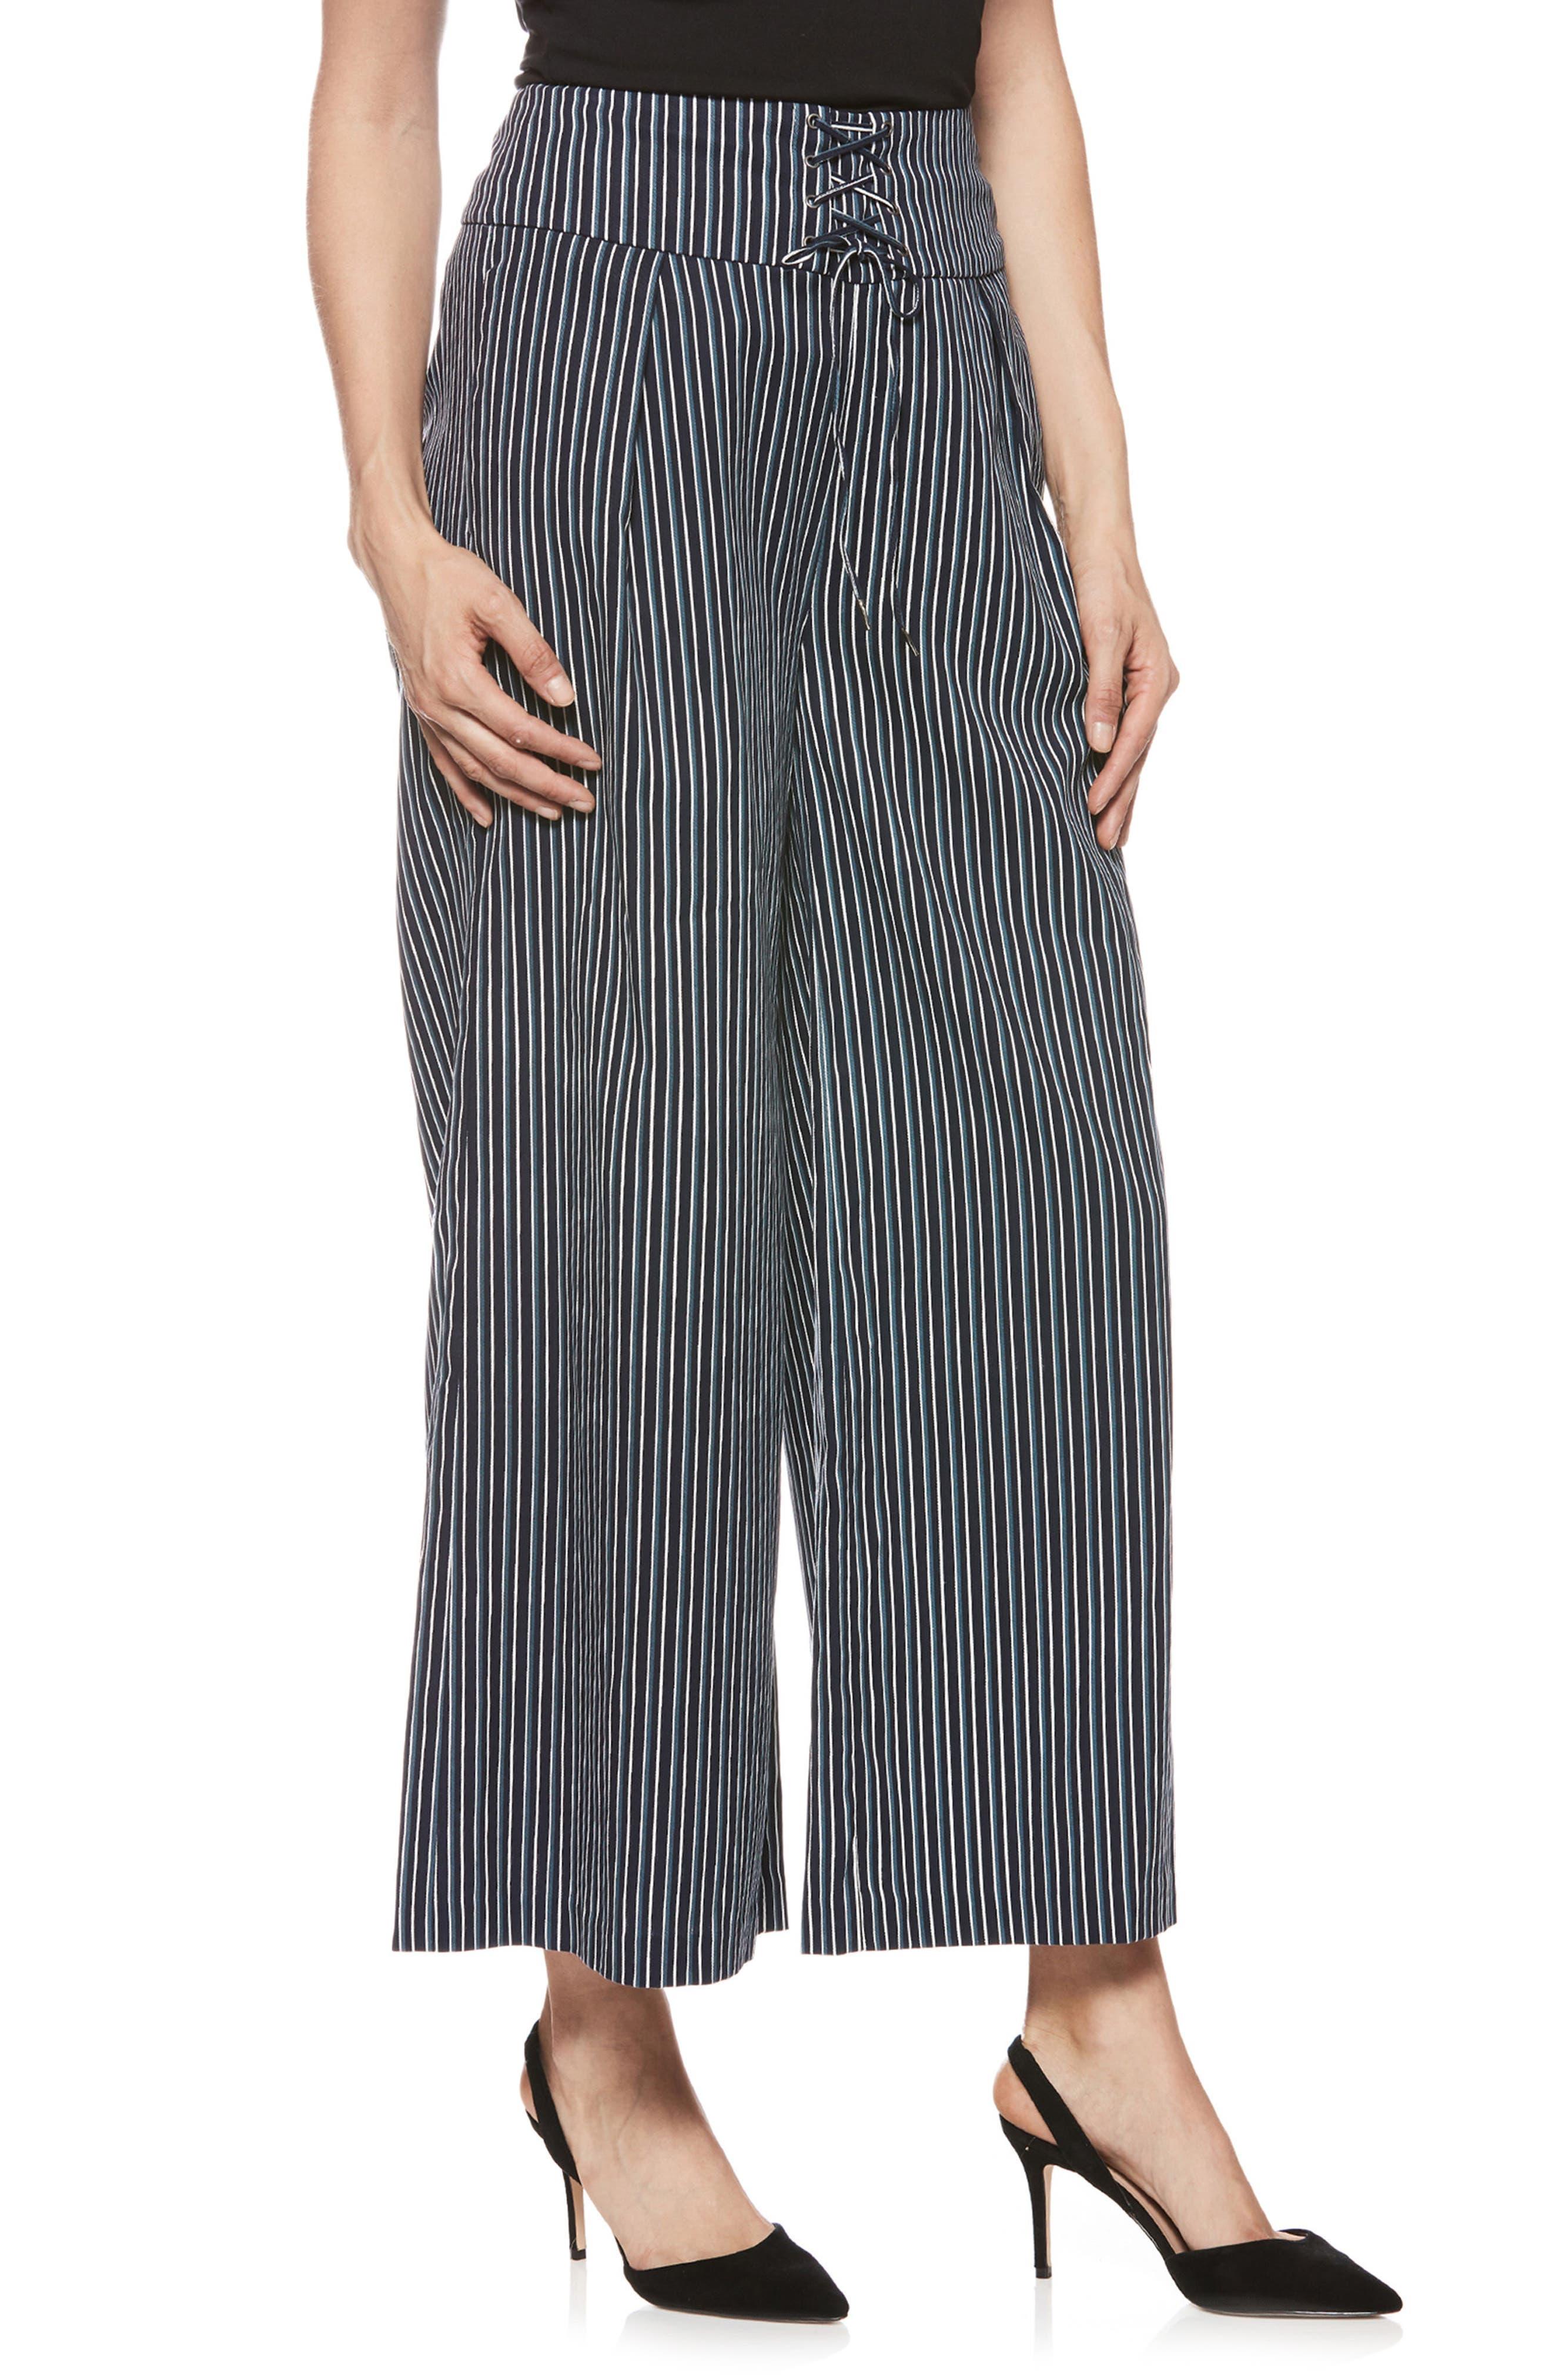 Charisma Pants,                         Main,                         color,